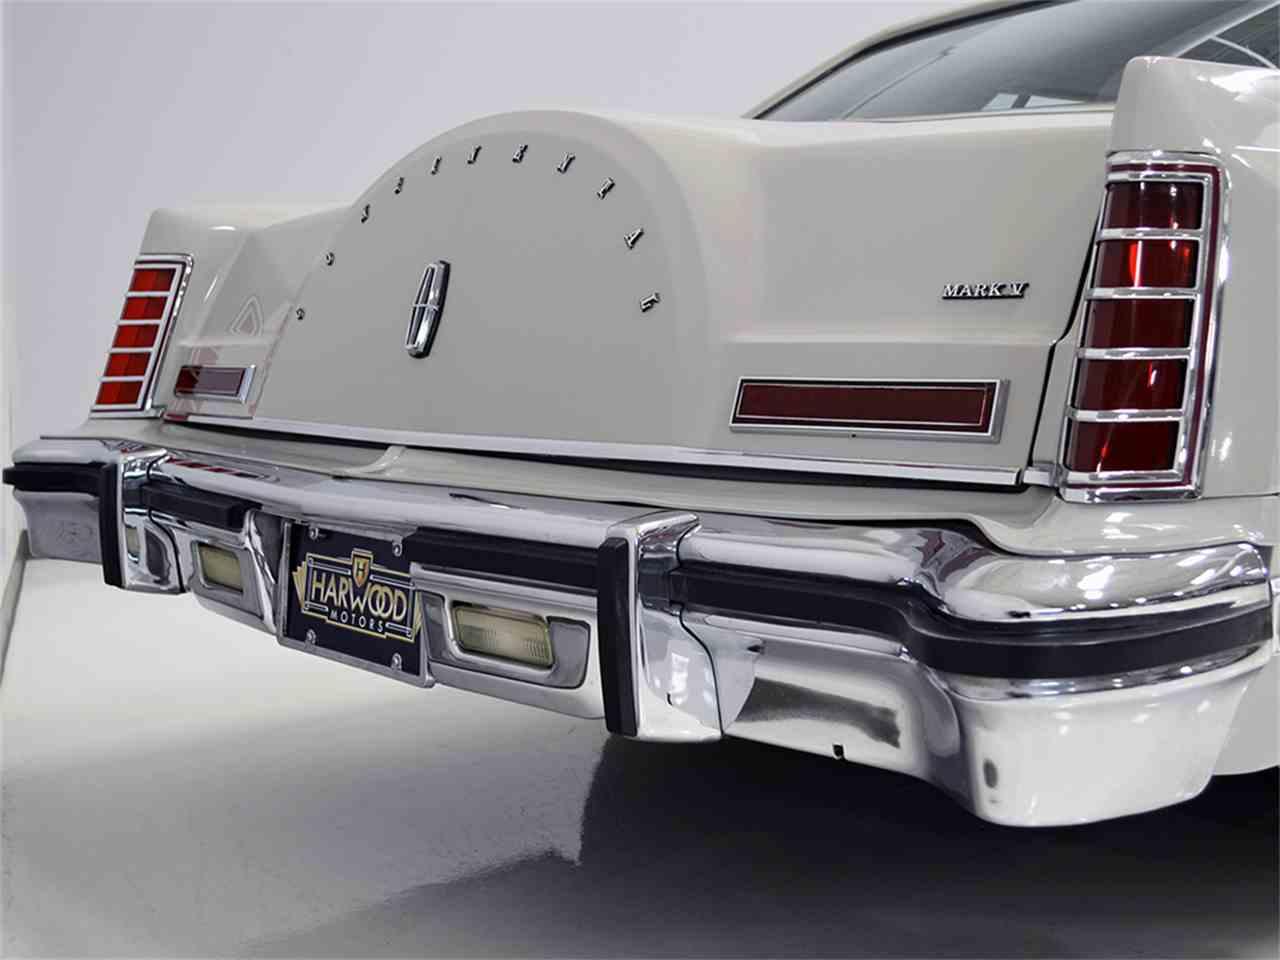 Large Picture of '77 Lincoln Continental Mark V - $13,900.00 Offered by Harwood Motors, LTD. - JOGC